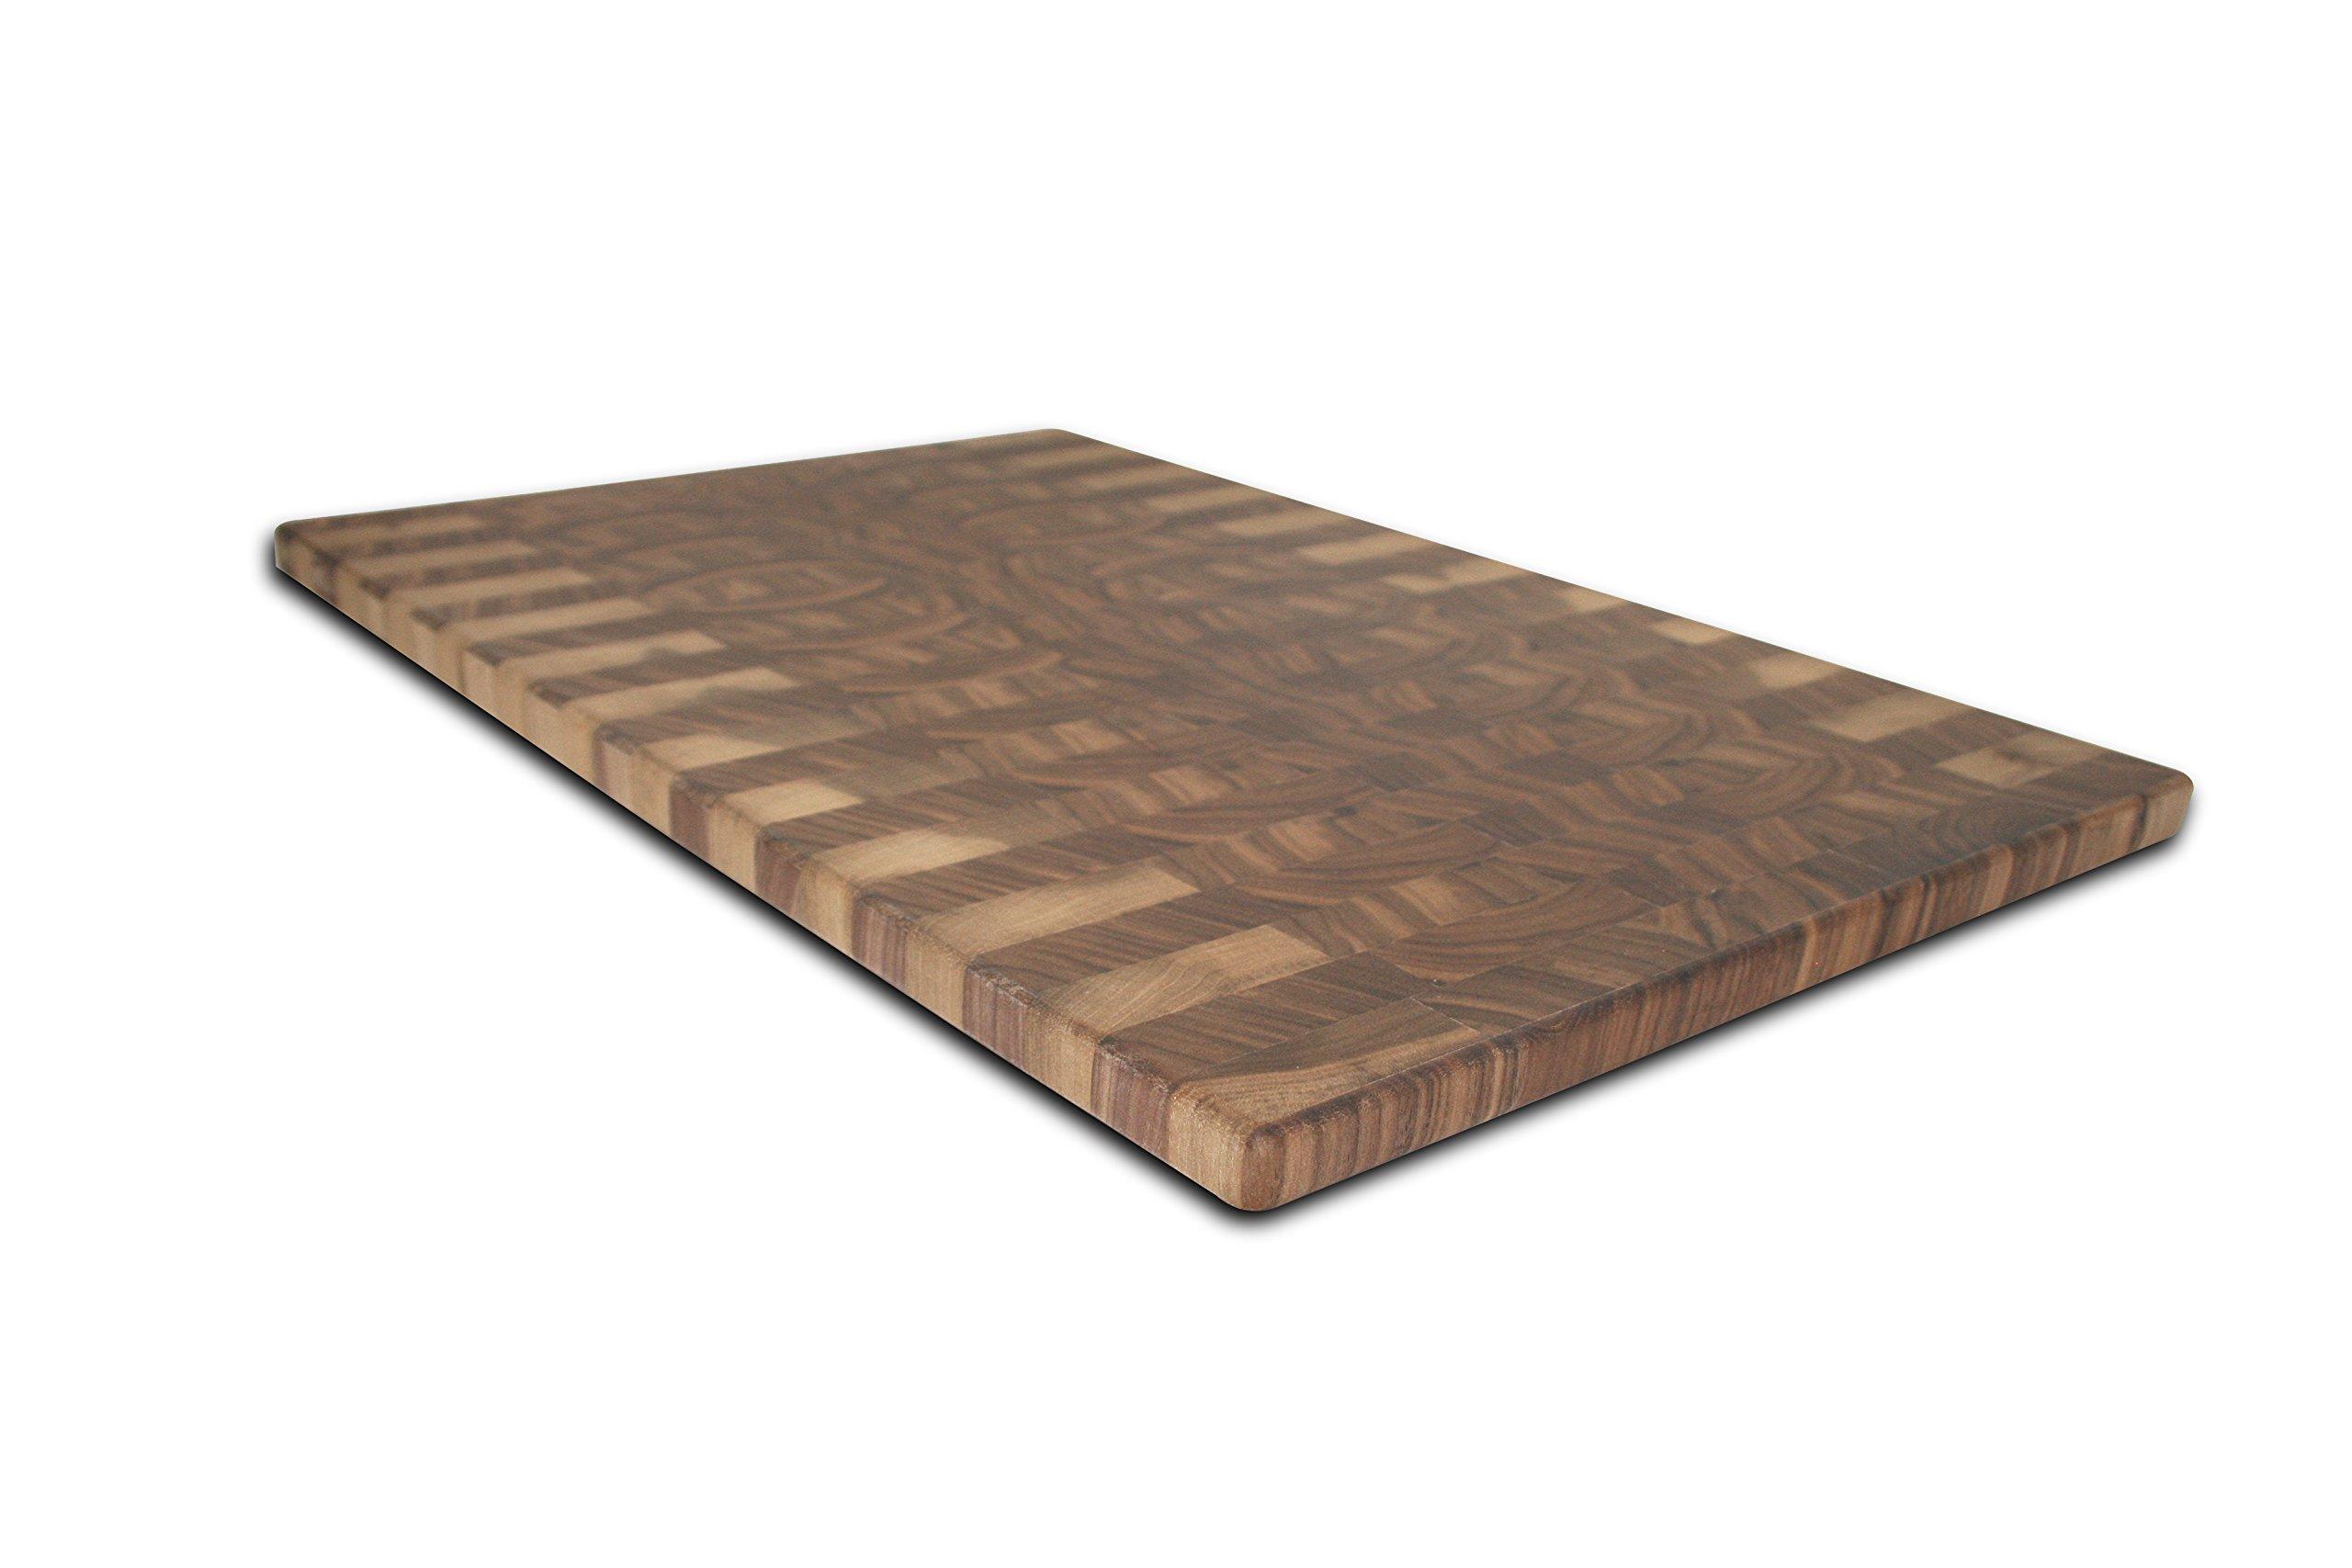 Top Chop Butcher Block Premium Reversible End Grain Cutting Board, Walnut, 20'' x 18'' x 3/4''